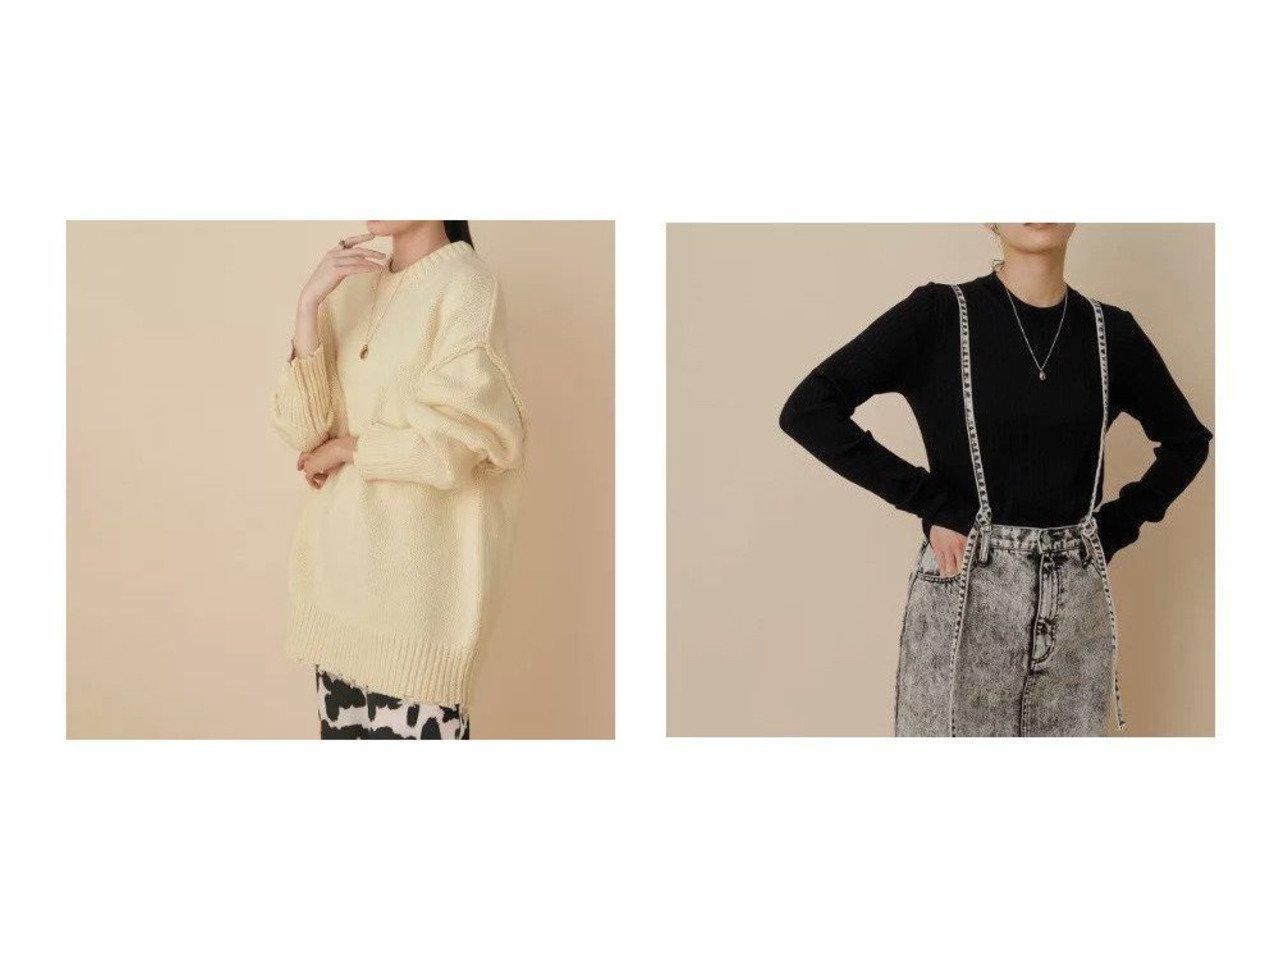 【ADAM ET ROPE'/アダム エ ロペ】のコットンフリンジBIGプルオーバー&ワイドリブニットプルオーバー ROPEのおすすめ!人気、トレンド・レディースファッションの通販  おすすめで人気の流行・トレンド、ファッションの通販商品 メンズファッション・キッズファッション・インテリア・家具・レディースファッション・服の通販 founy(ファニー) https://founy.com/ ファッション Fashion レディースファッション WOMEN トップス Tops Tshirt ニット Knit Tops プルオーバー Pullover アクリル 春 Spring 今季 セーター フリンジ ベーシック ボトム ポケット 2021年 2021 S/S 春夏 SS Spring/Summer 2021 春夏 S/S SS Spring/Summer 2021 |ID:crp329100000018828